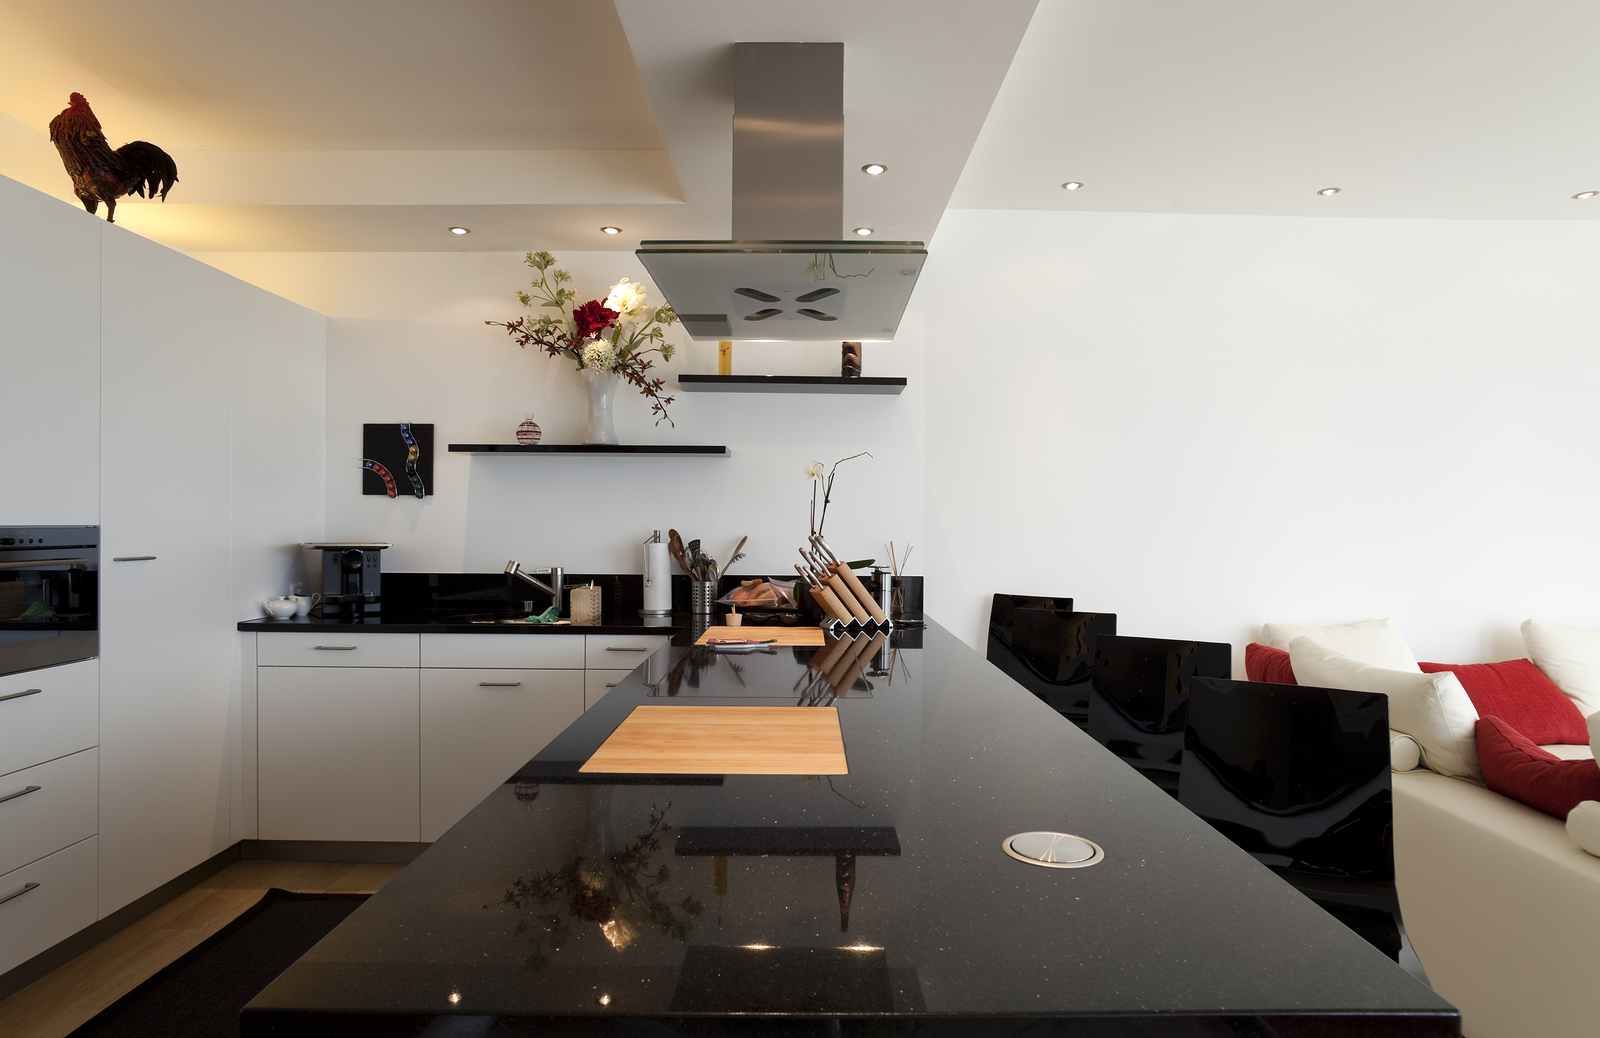 bigstock-beautiful-interior-of-a-modern-15682016.jpg